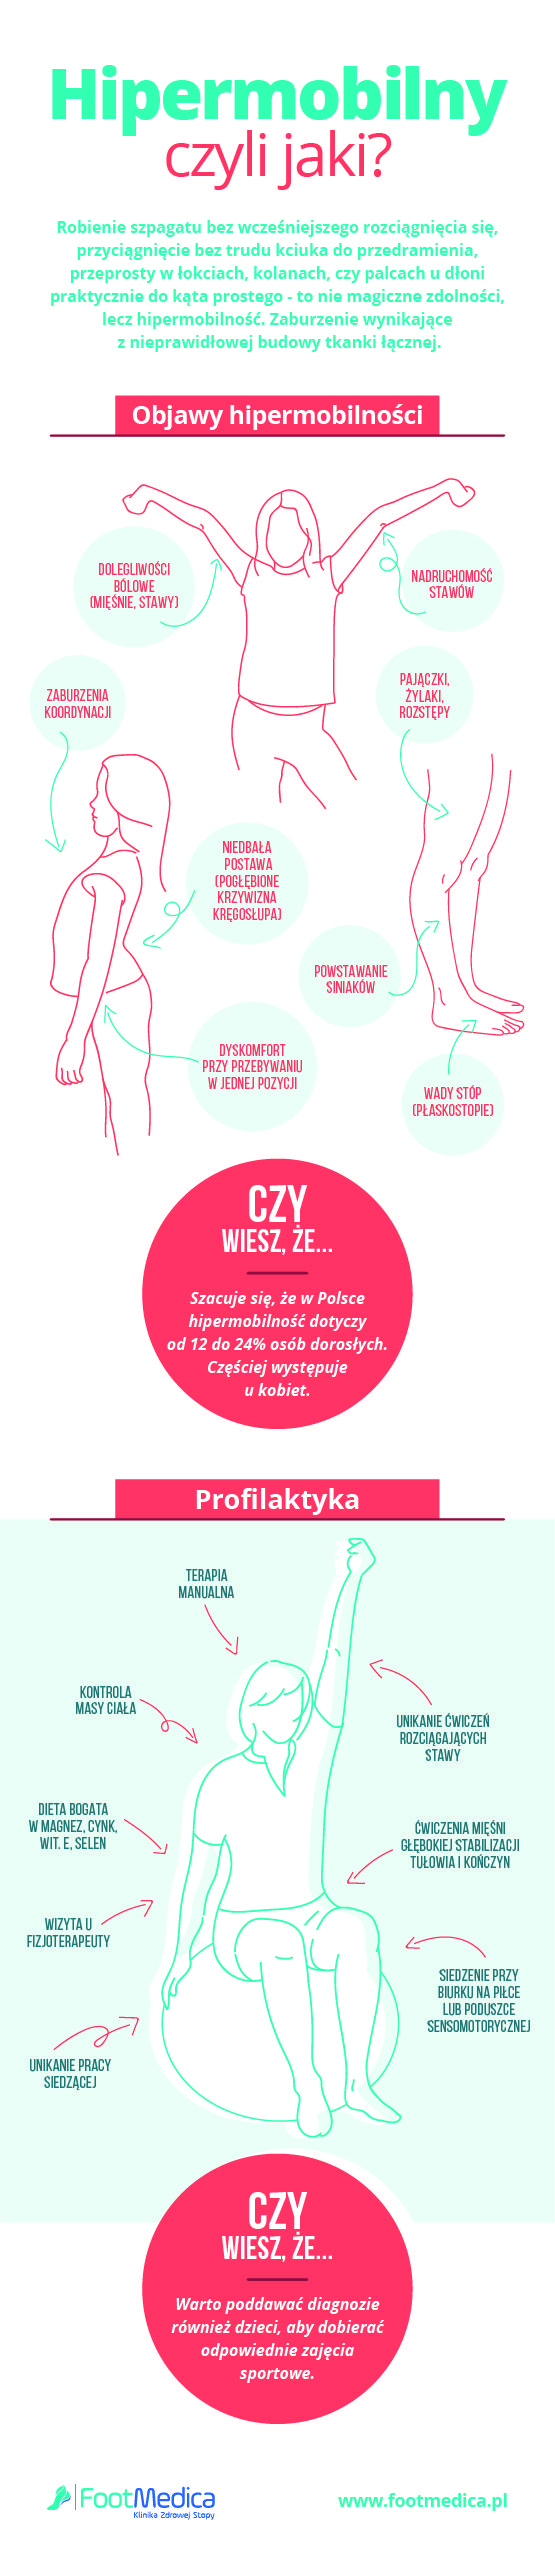 hiprmobilny